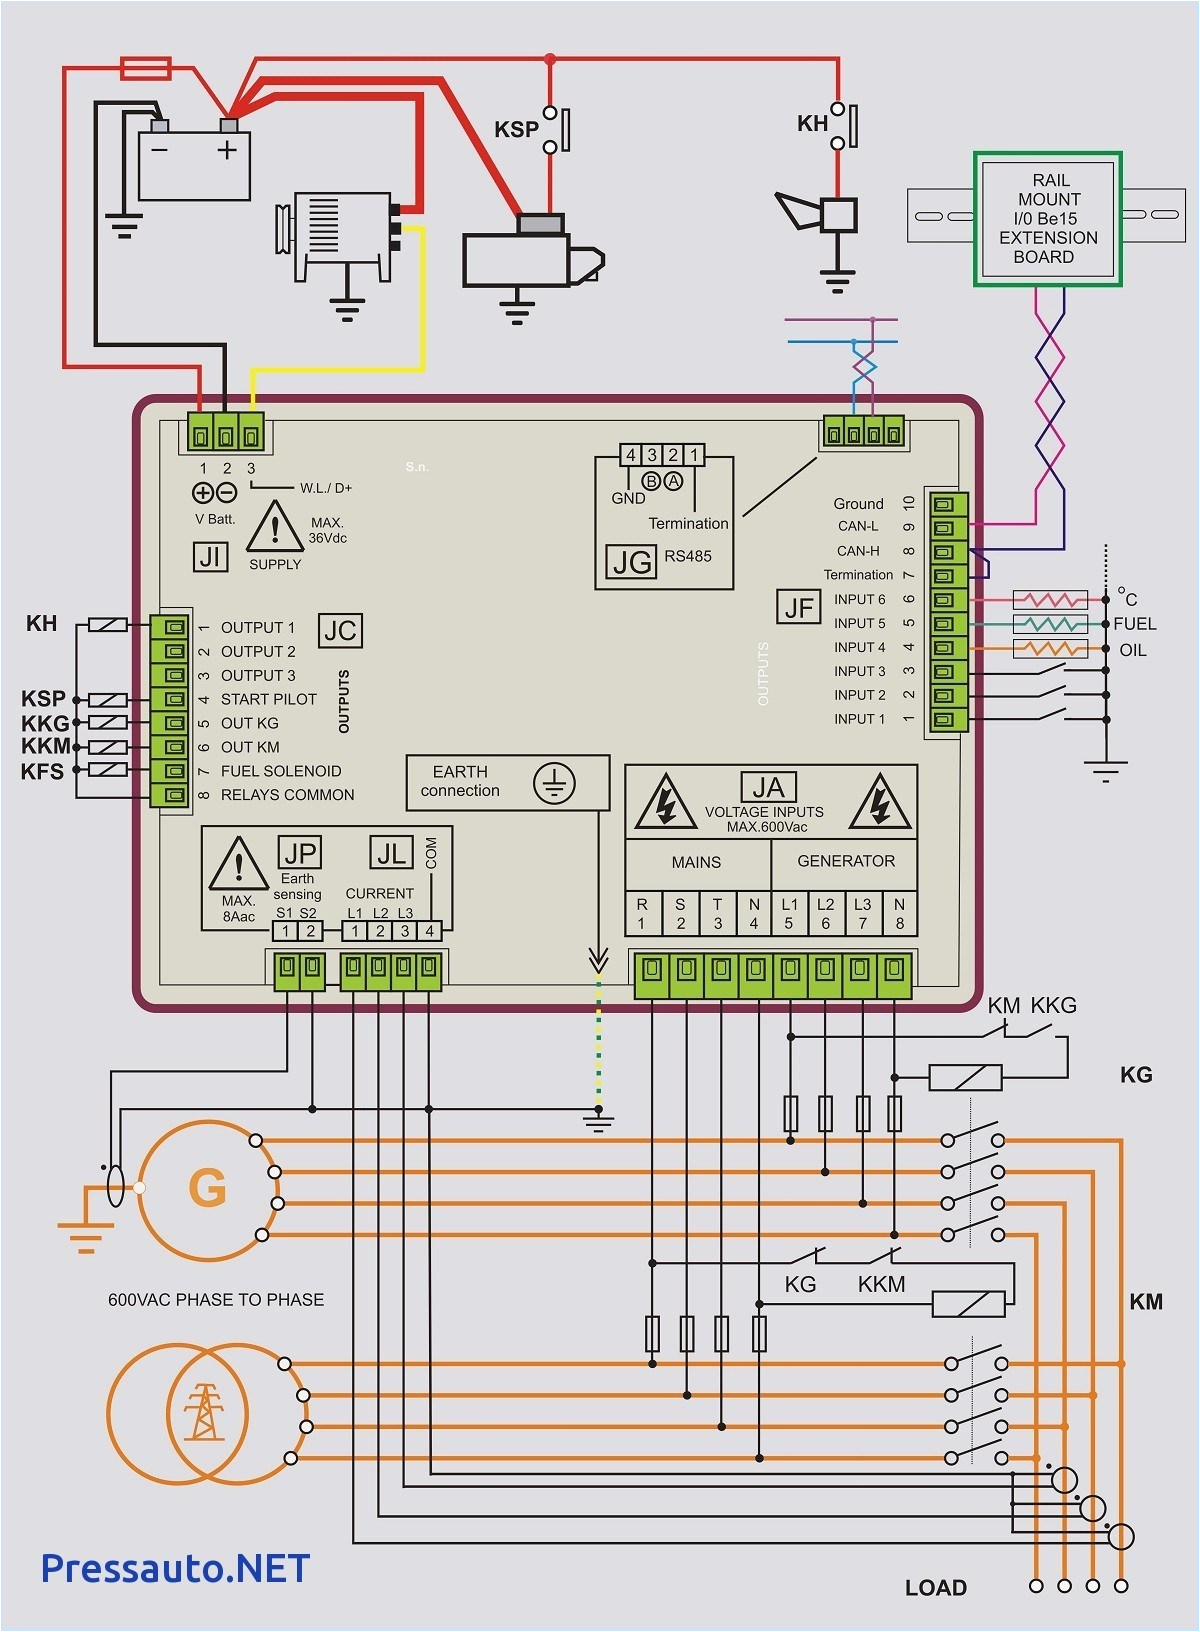 10 kw generac wiring diagram schema diagram databaseportablegeneratorwiringschematic diagram electrical schematic 10 kw generac wiring diagram